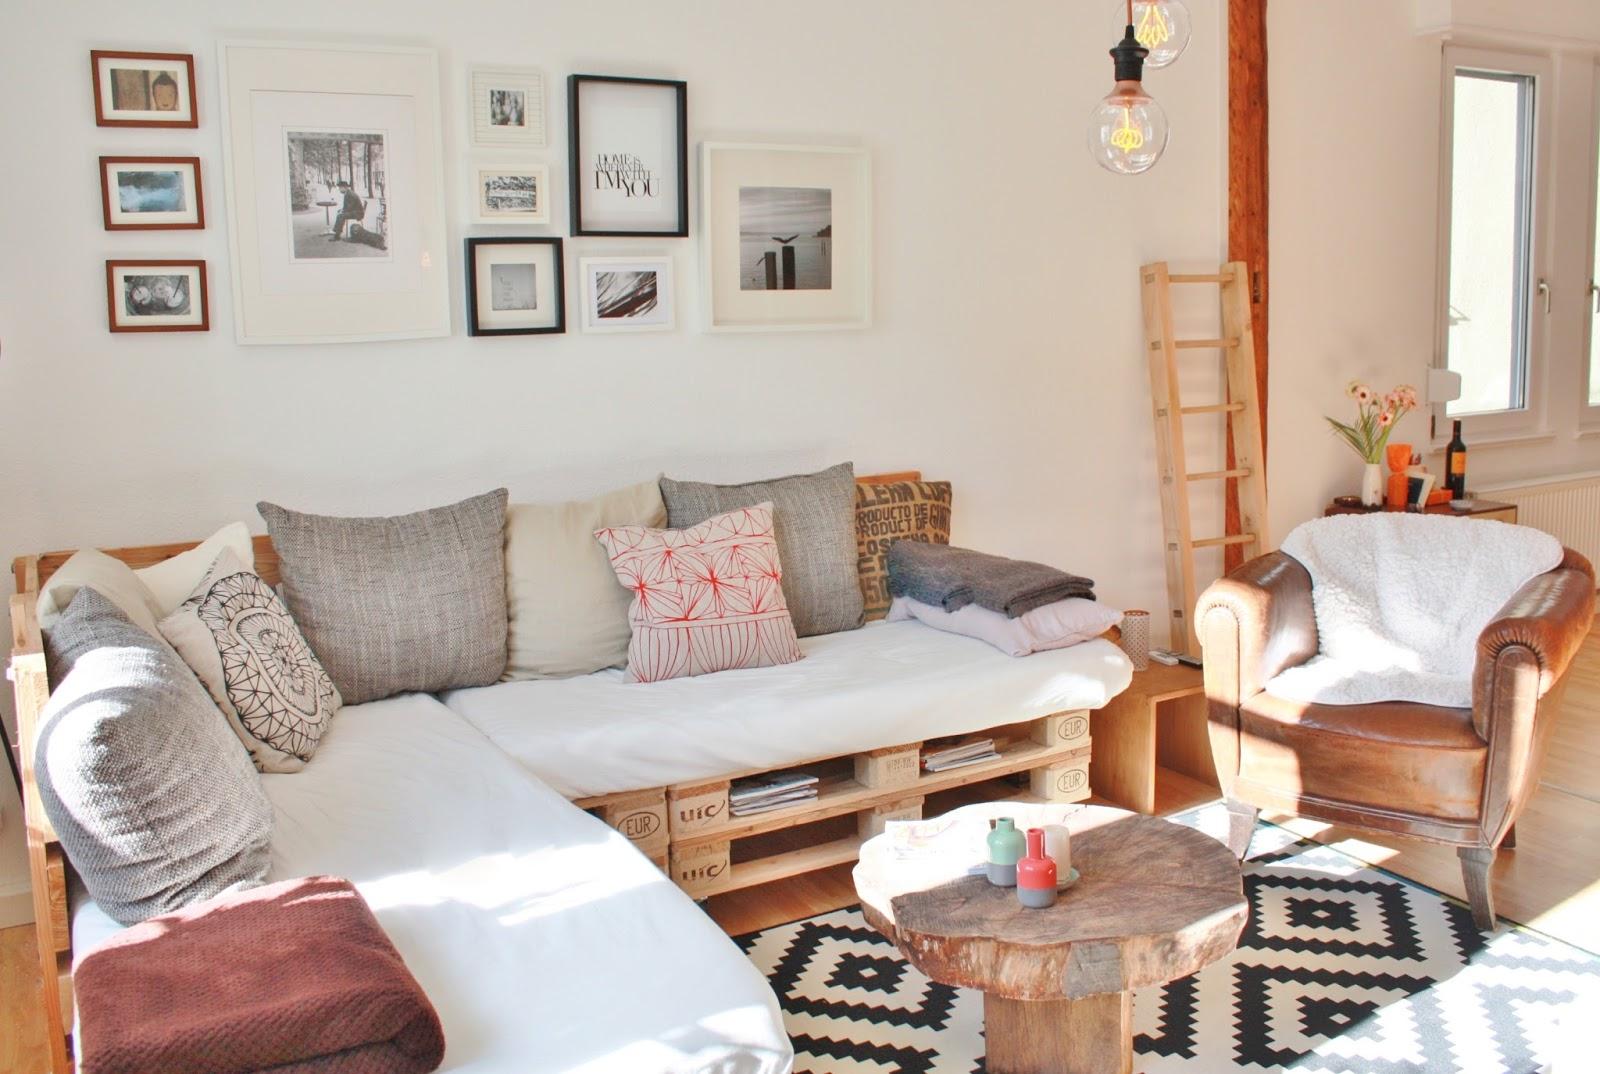 fair fashion interior design einmal palettencouch bitte. Black Bedroom Furniture Sets. Home Design Ideas